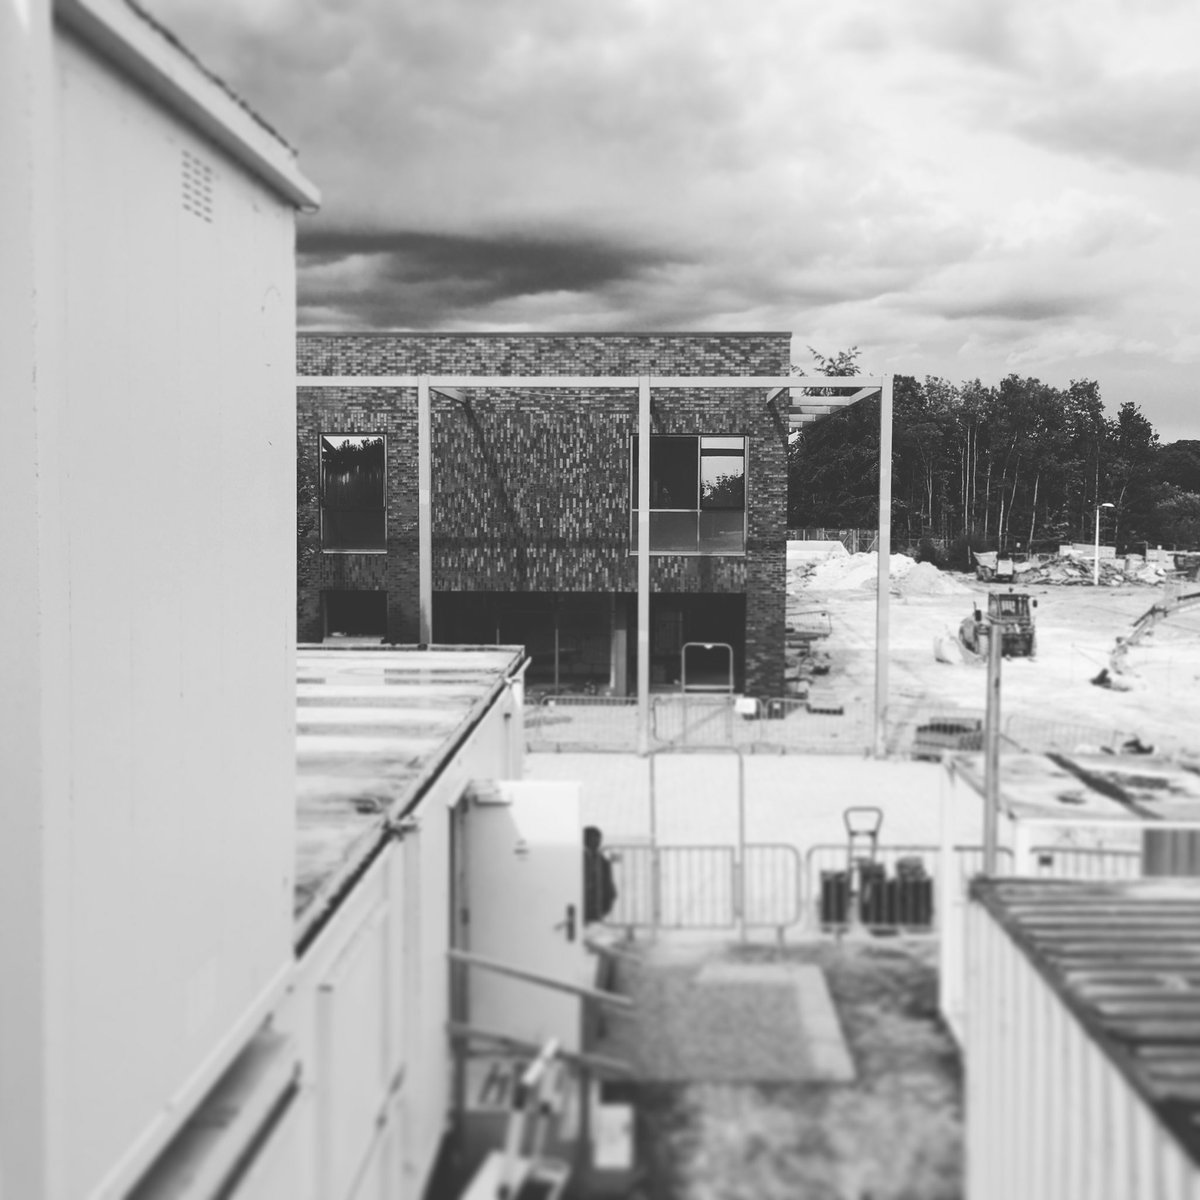 HCC Architects, HCC_Landscape, HCC Interior Design And 3 Others